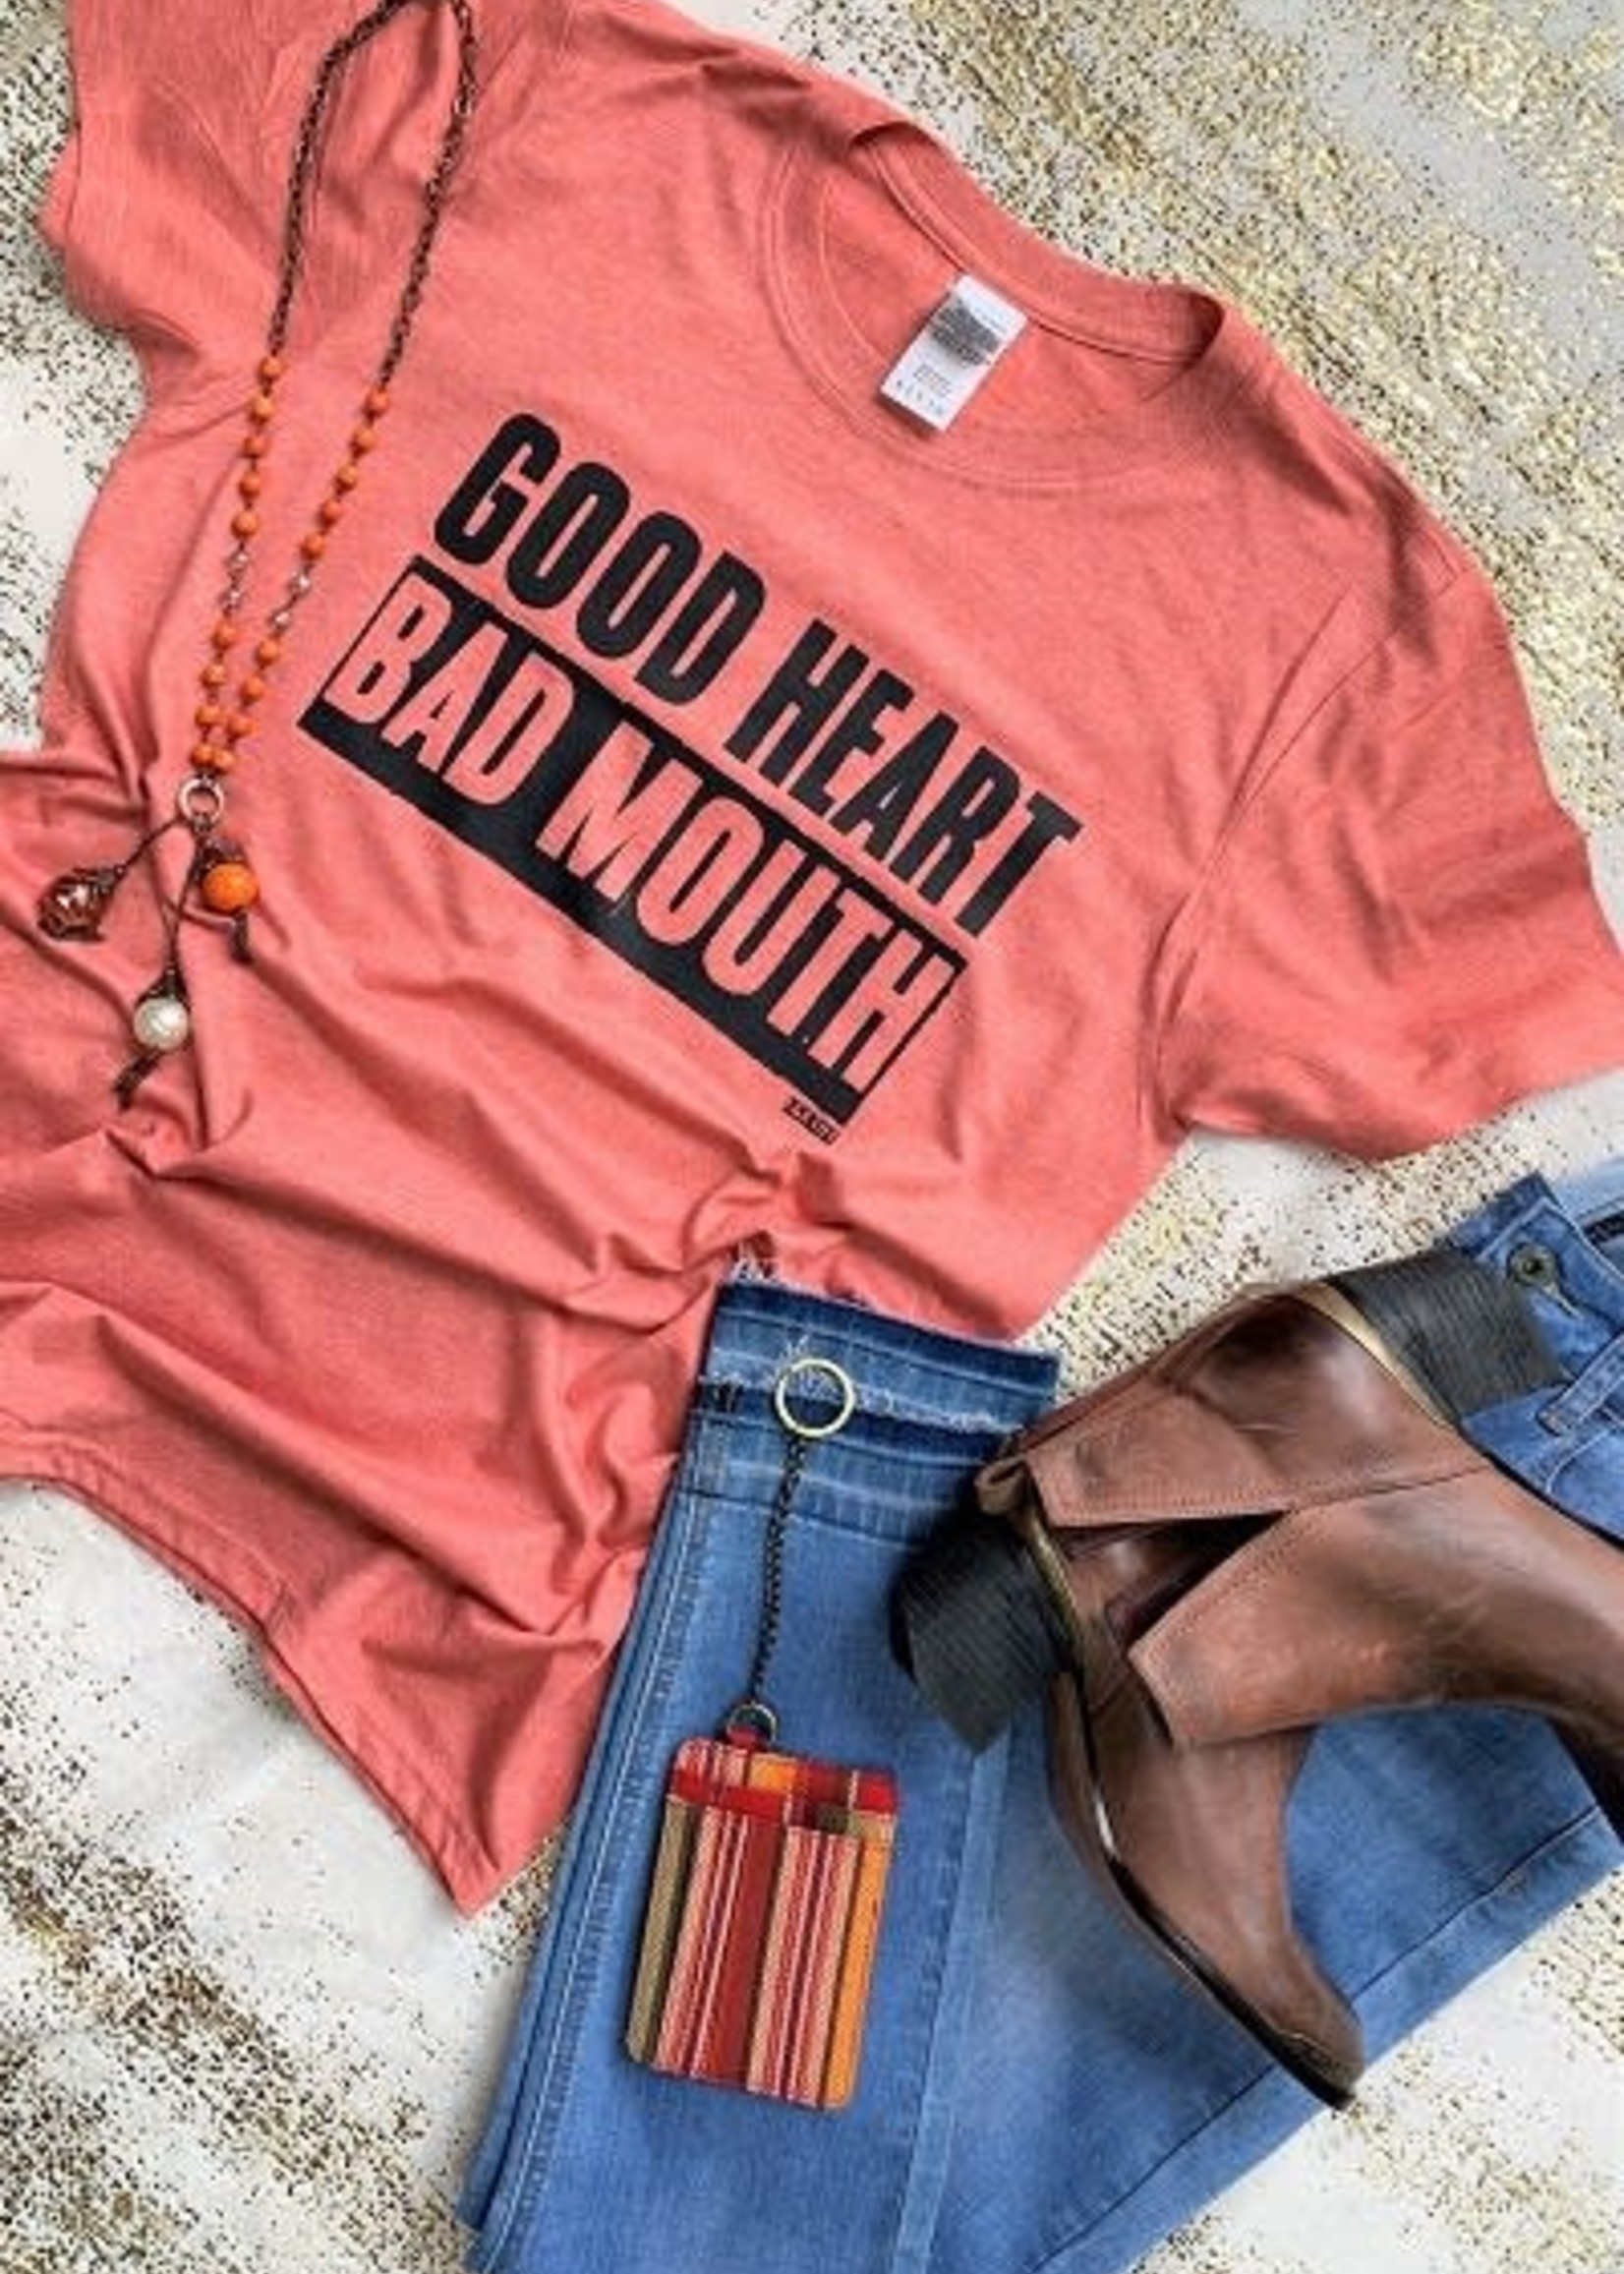 Good Heart Bad Mouth Tee